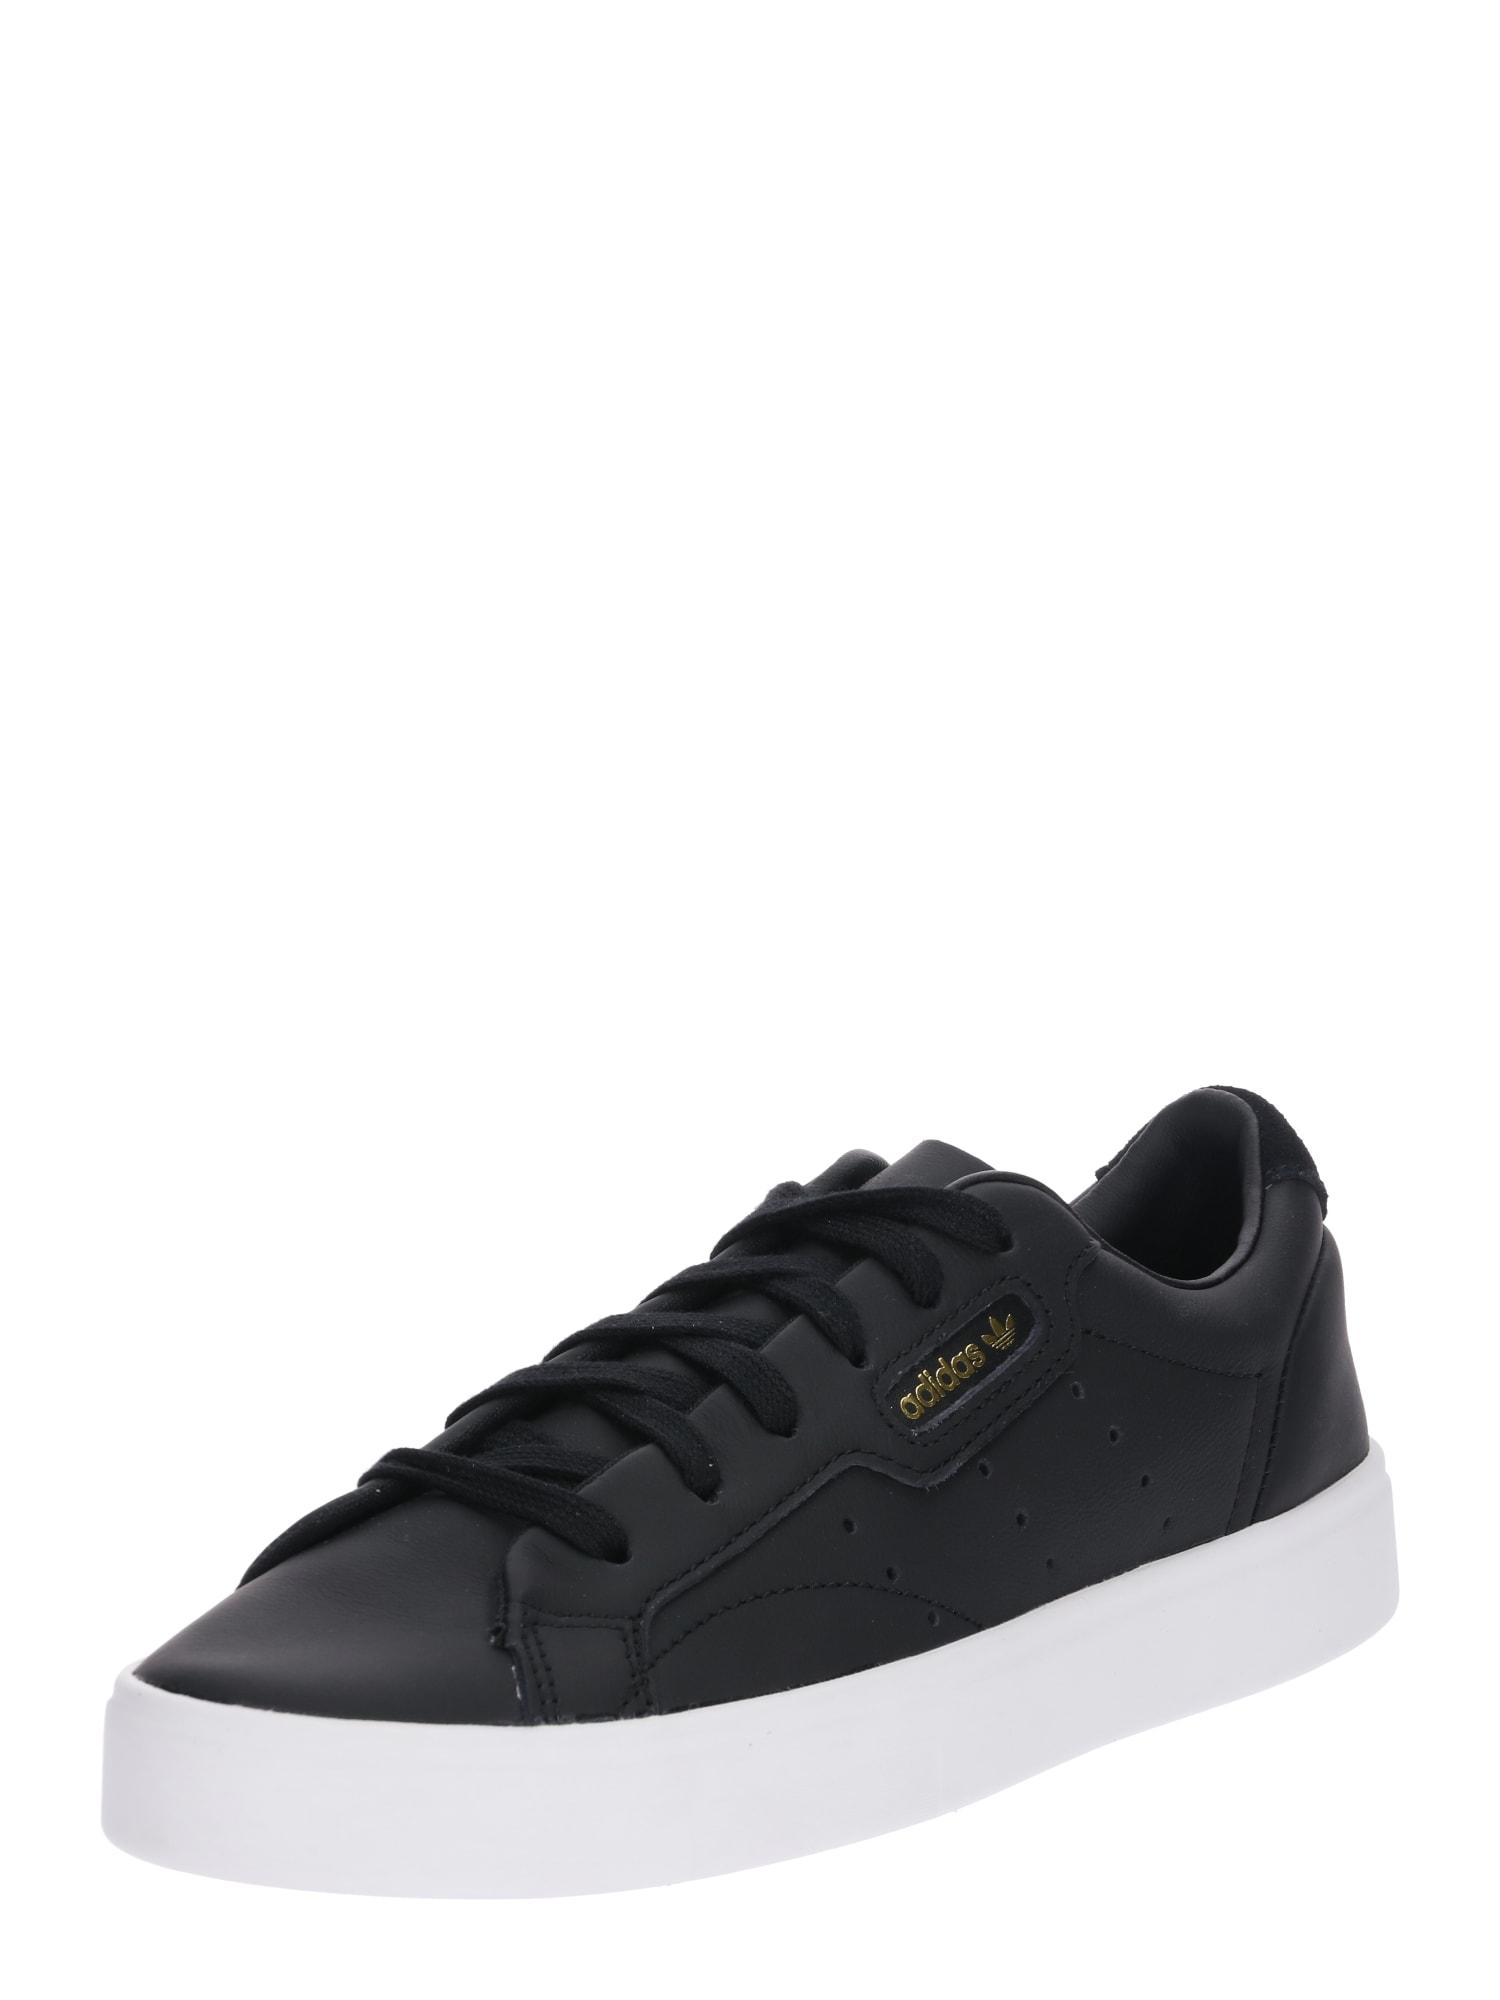 ADIDAS ORIGINALS, Dames Sneakers laag 'Sleek', zwart